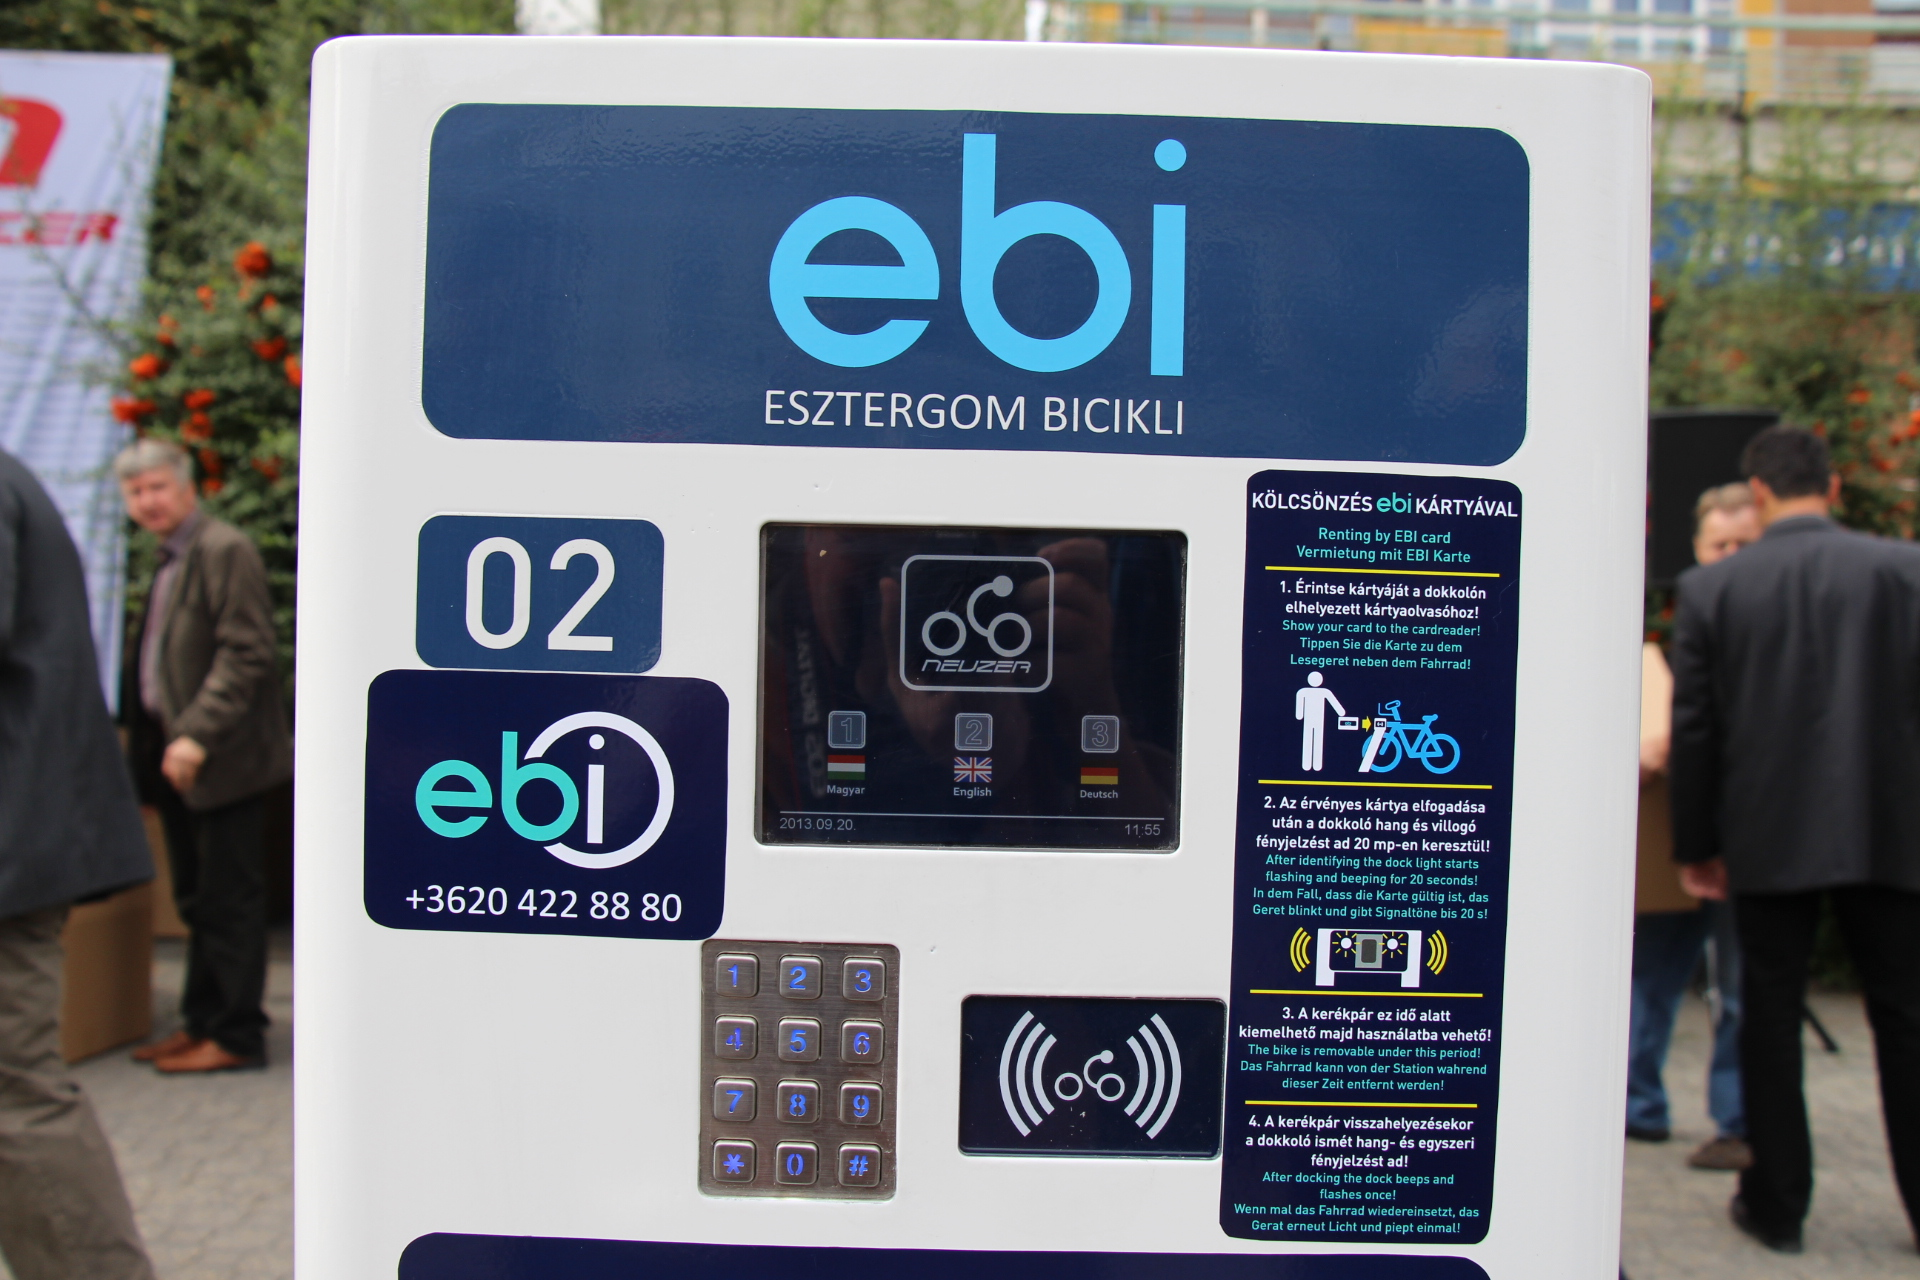 EBI Esztergomi Bicikli